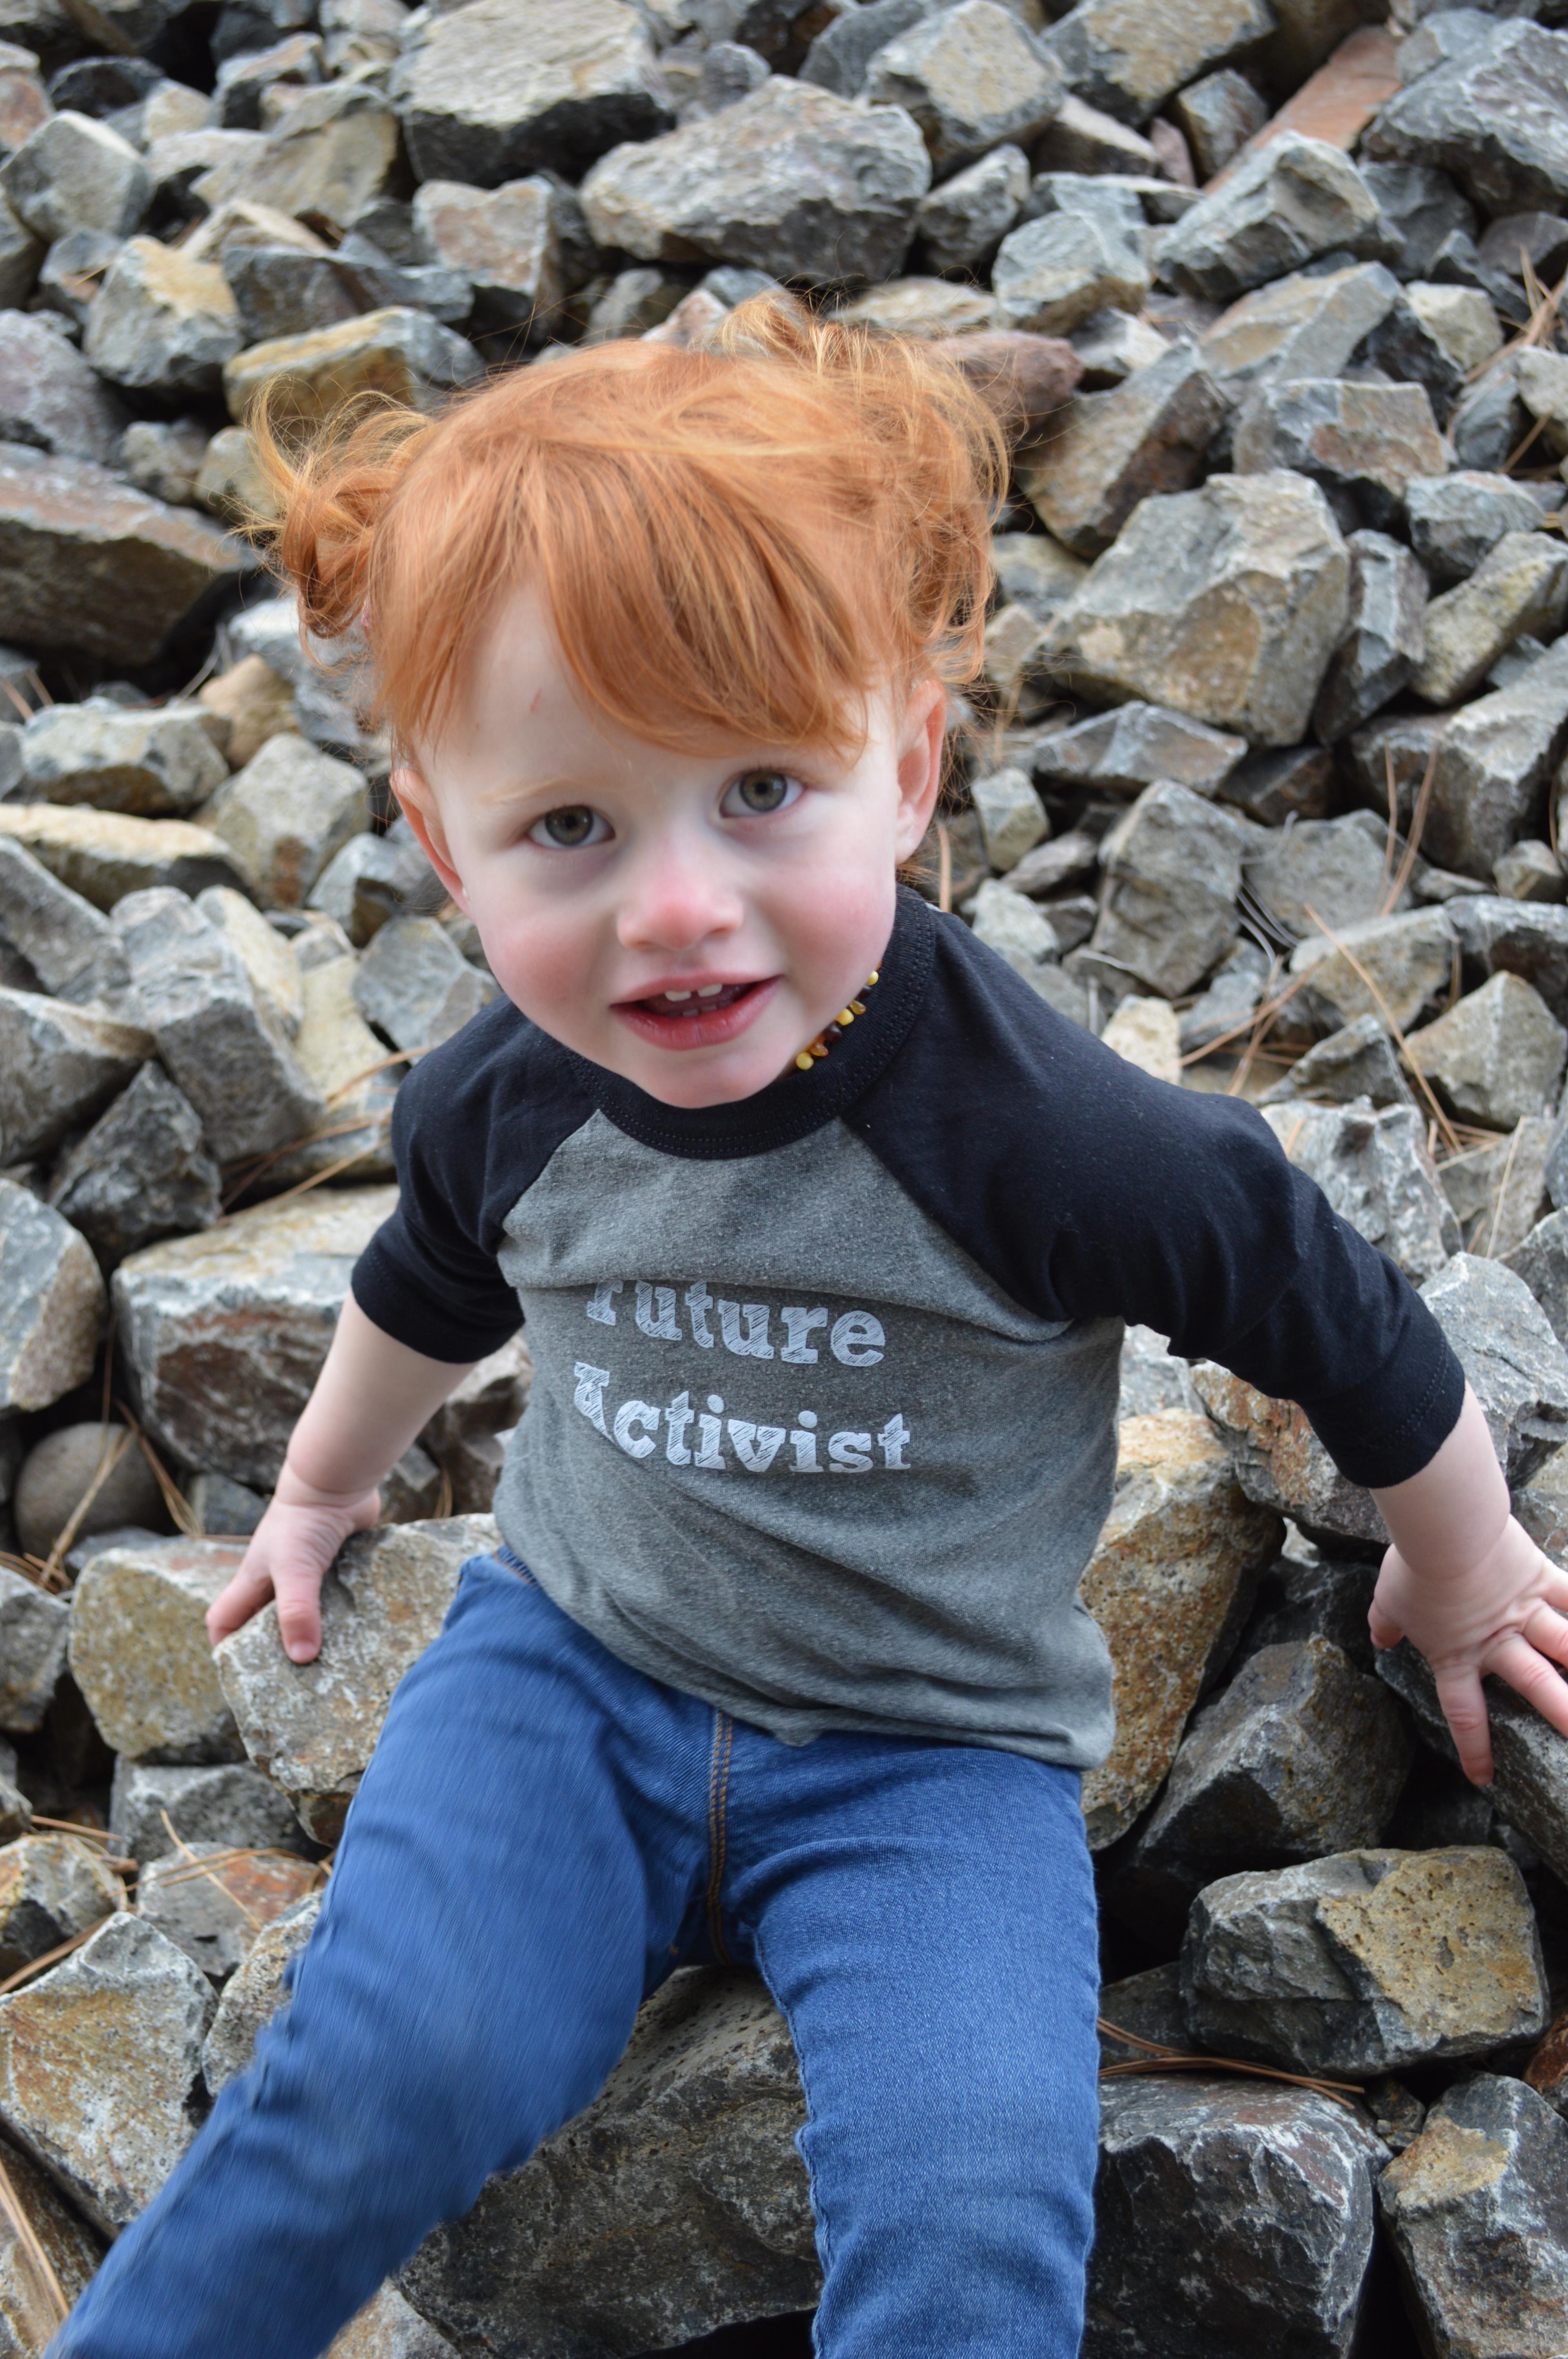 Future Activist Toddler Baseball Tee 00012